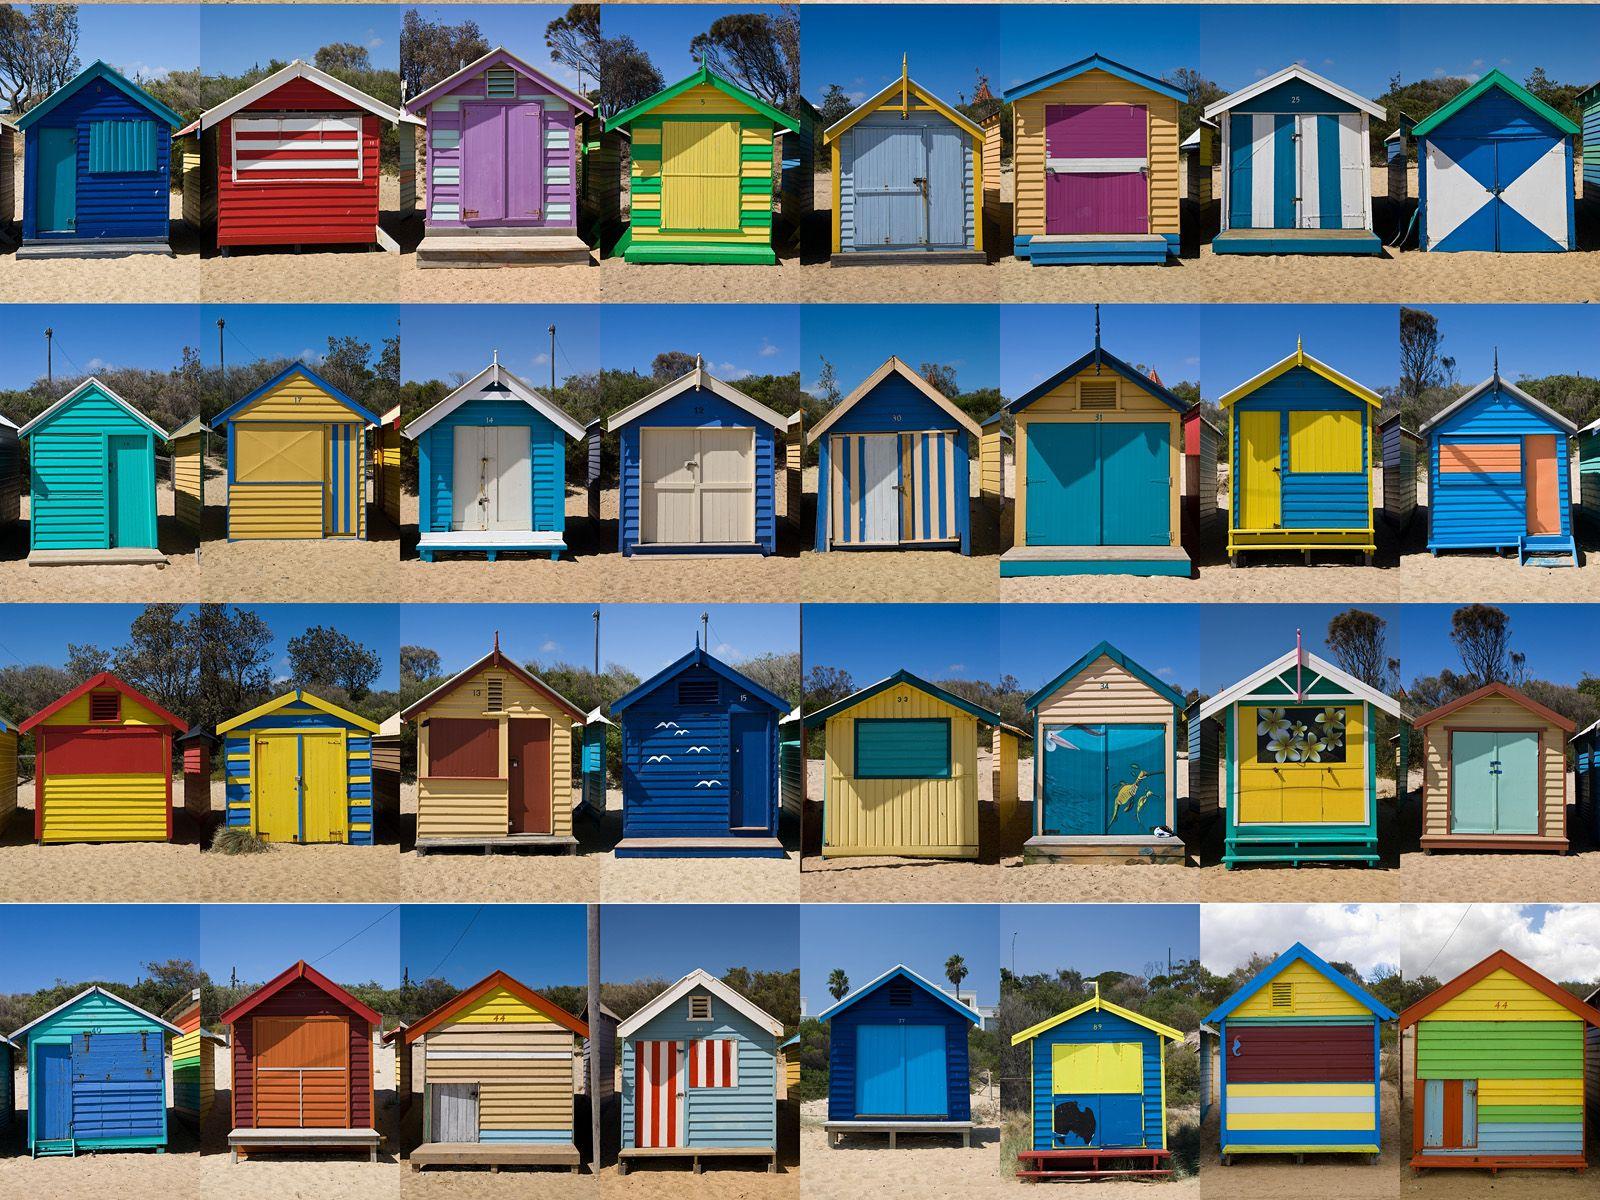 Cabanas on brighton beach melbourne australia travel for Beach house designs melbourne